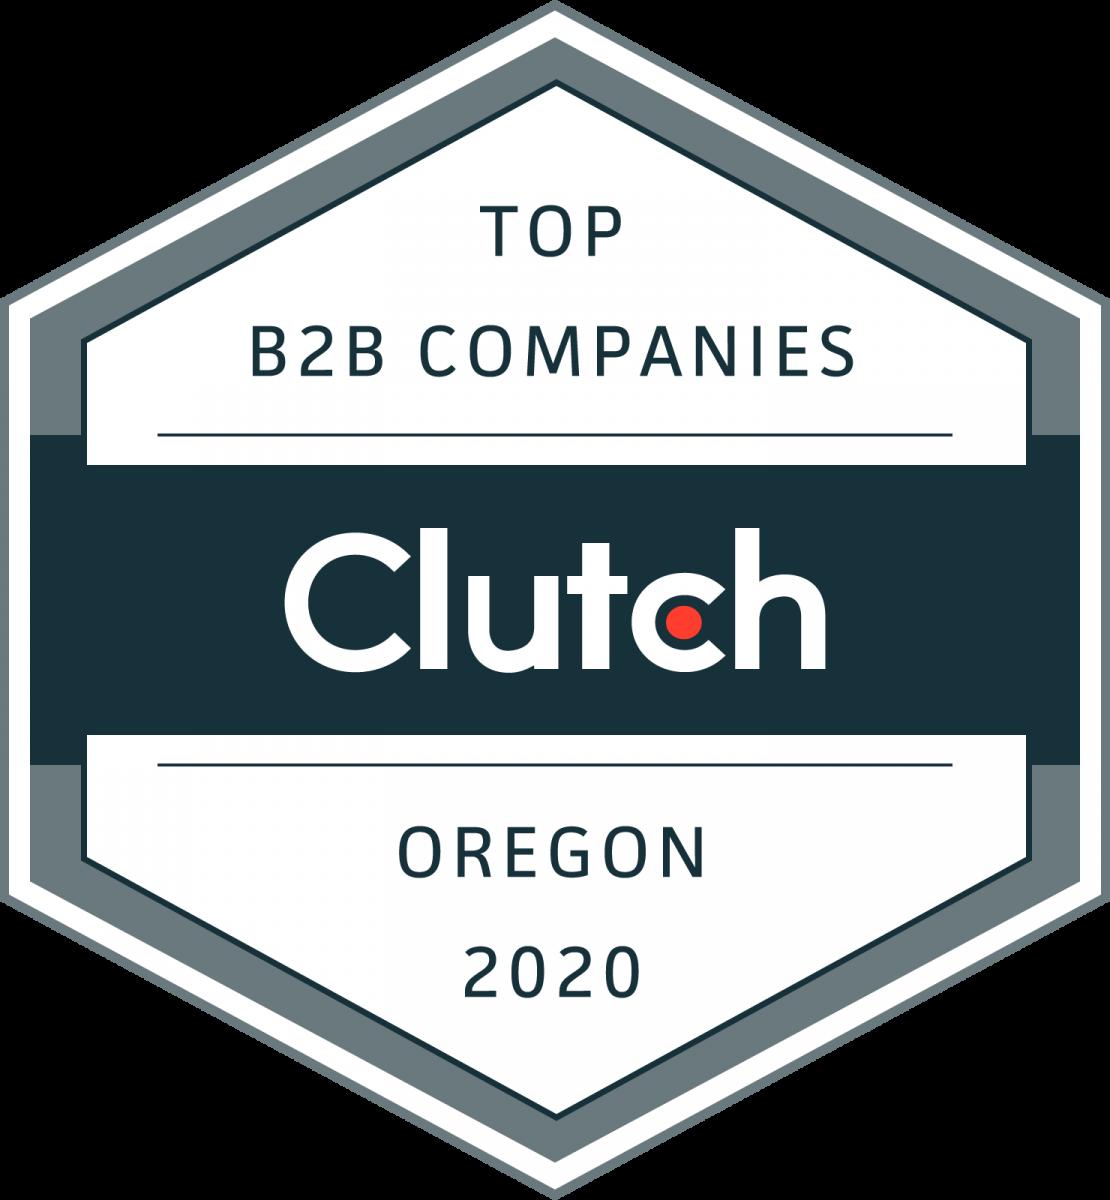 Top Oregon B2B Company